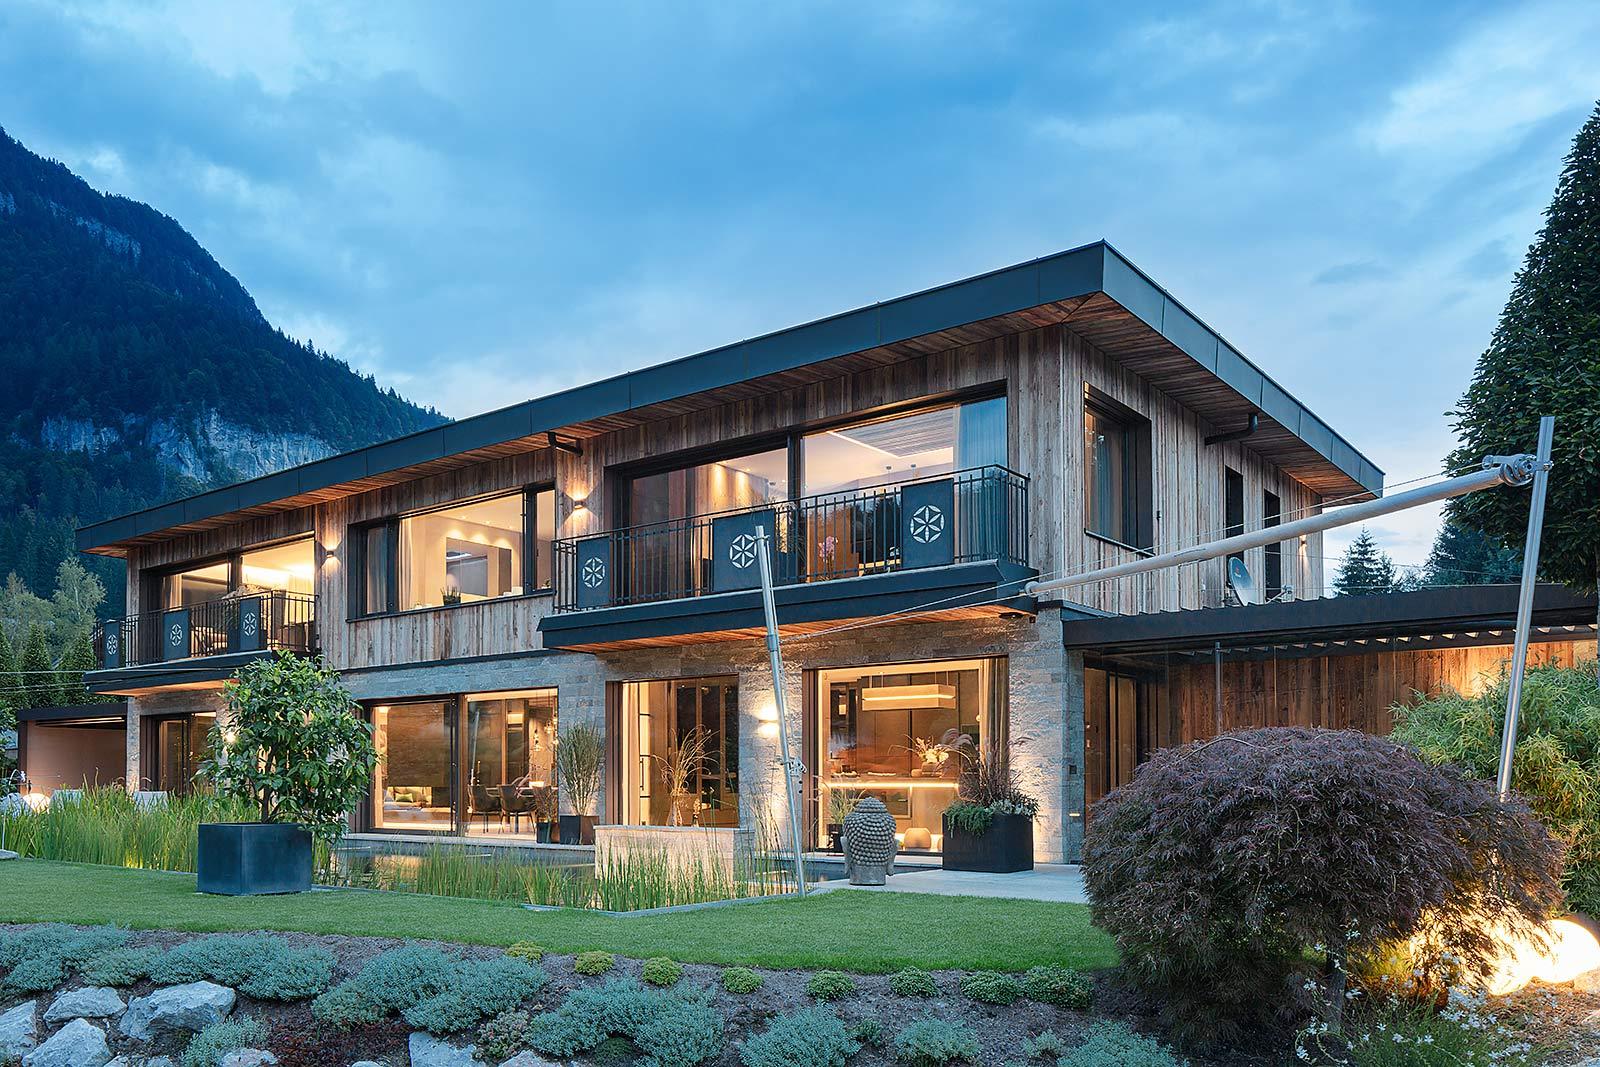 abendaufnahme-blaue-stunde-architekturfotografie